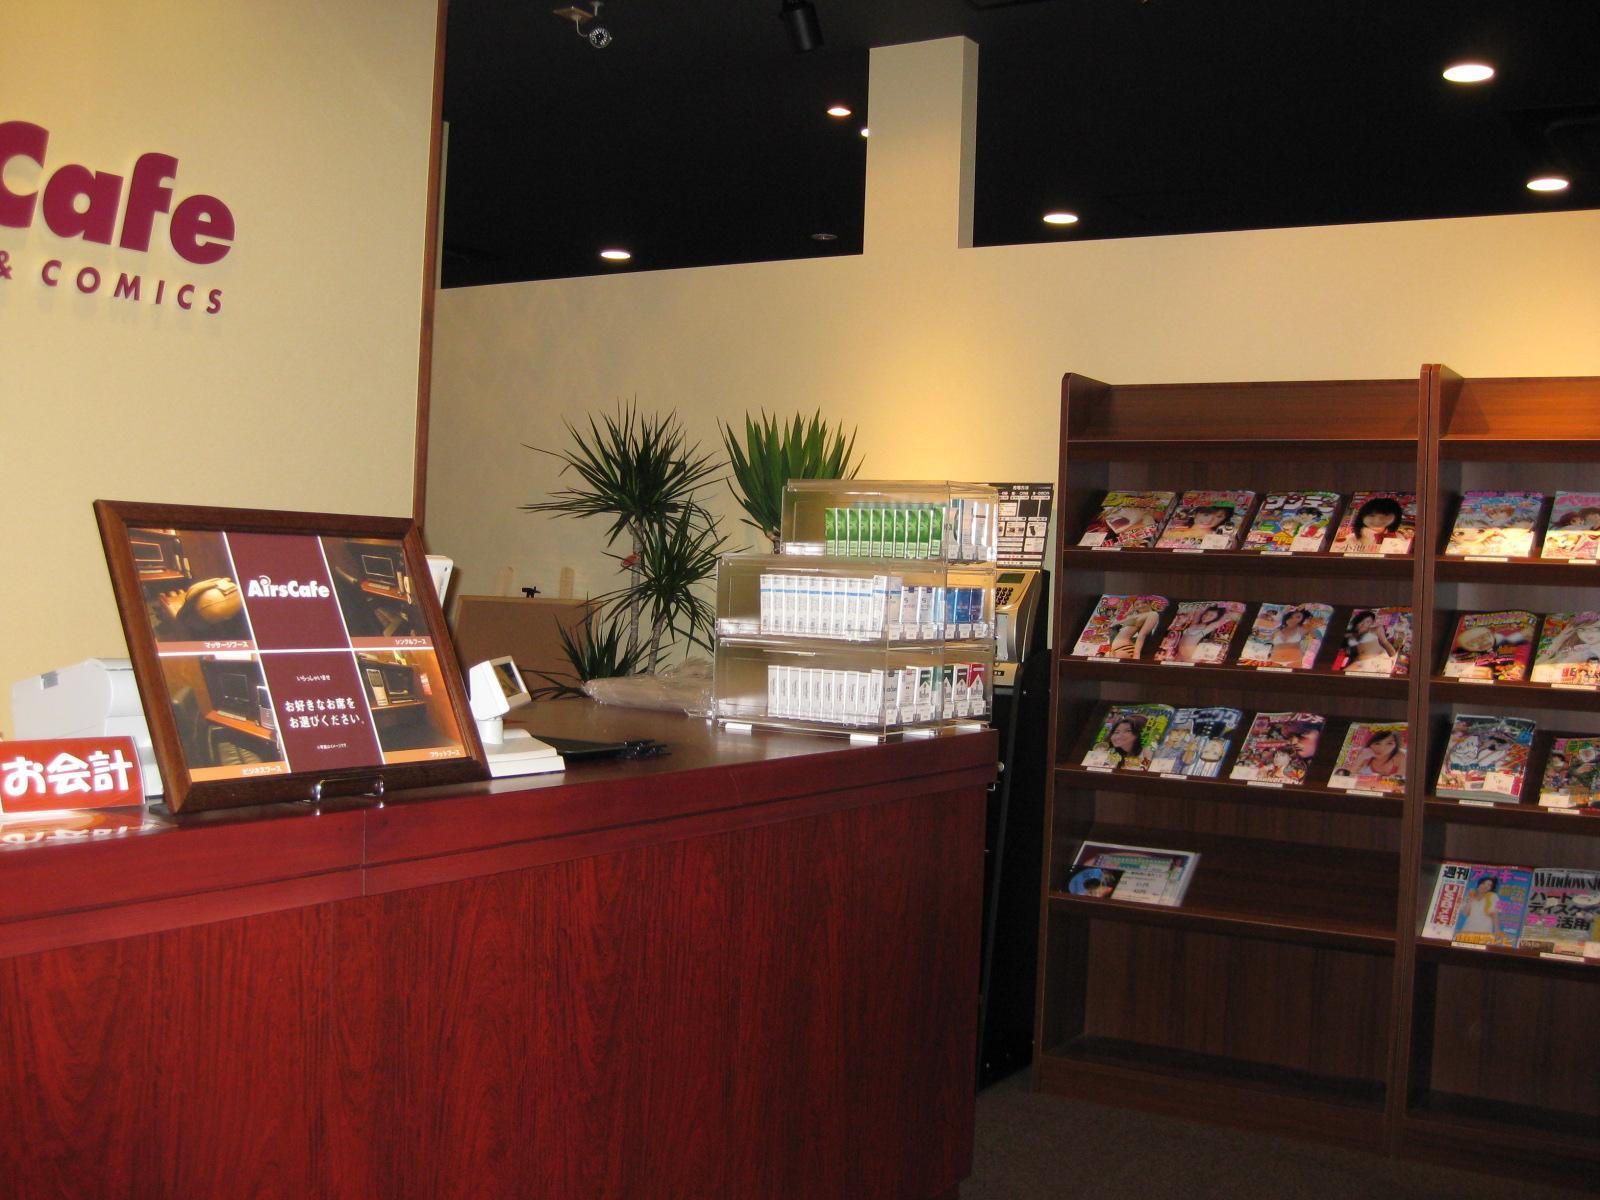 AirsCafe 花小金井店